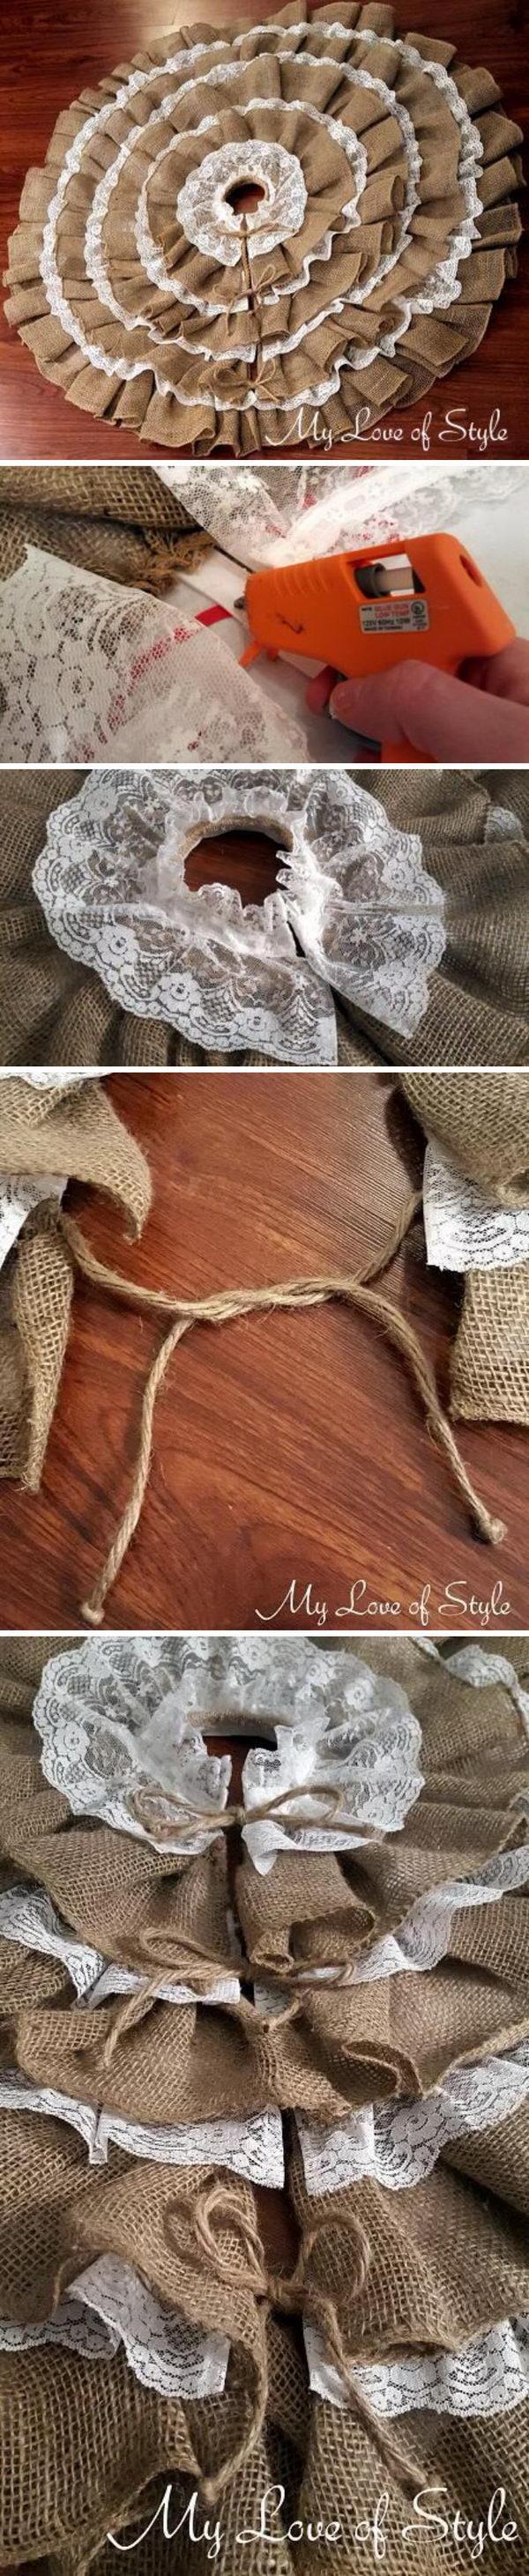 DIY No Sew Burlap and Lace Christmas Tree Skirt.